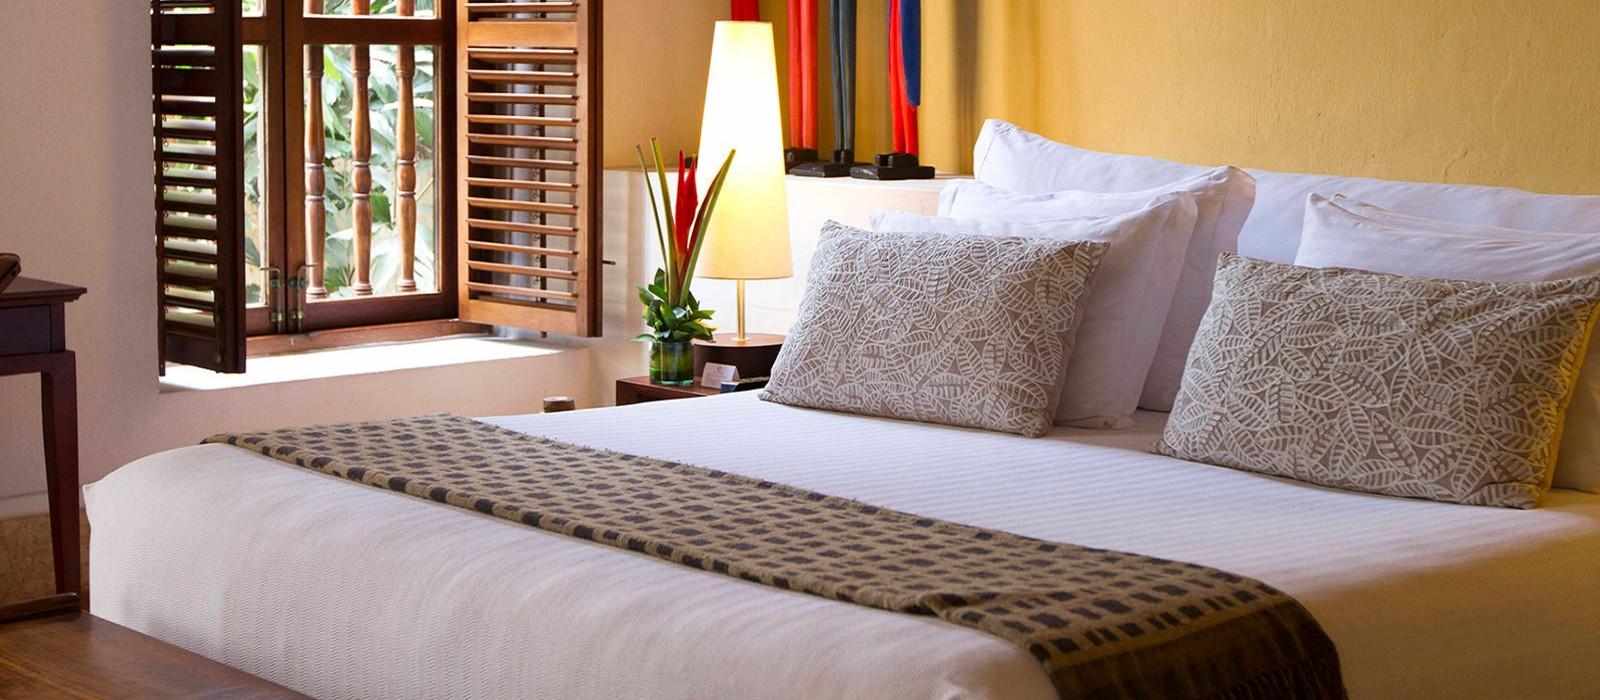 Hotel  Quadrofolio Colombia